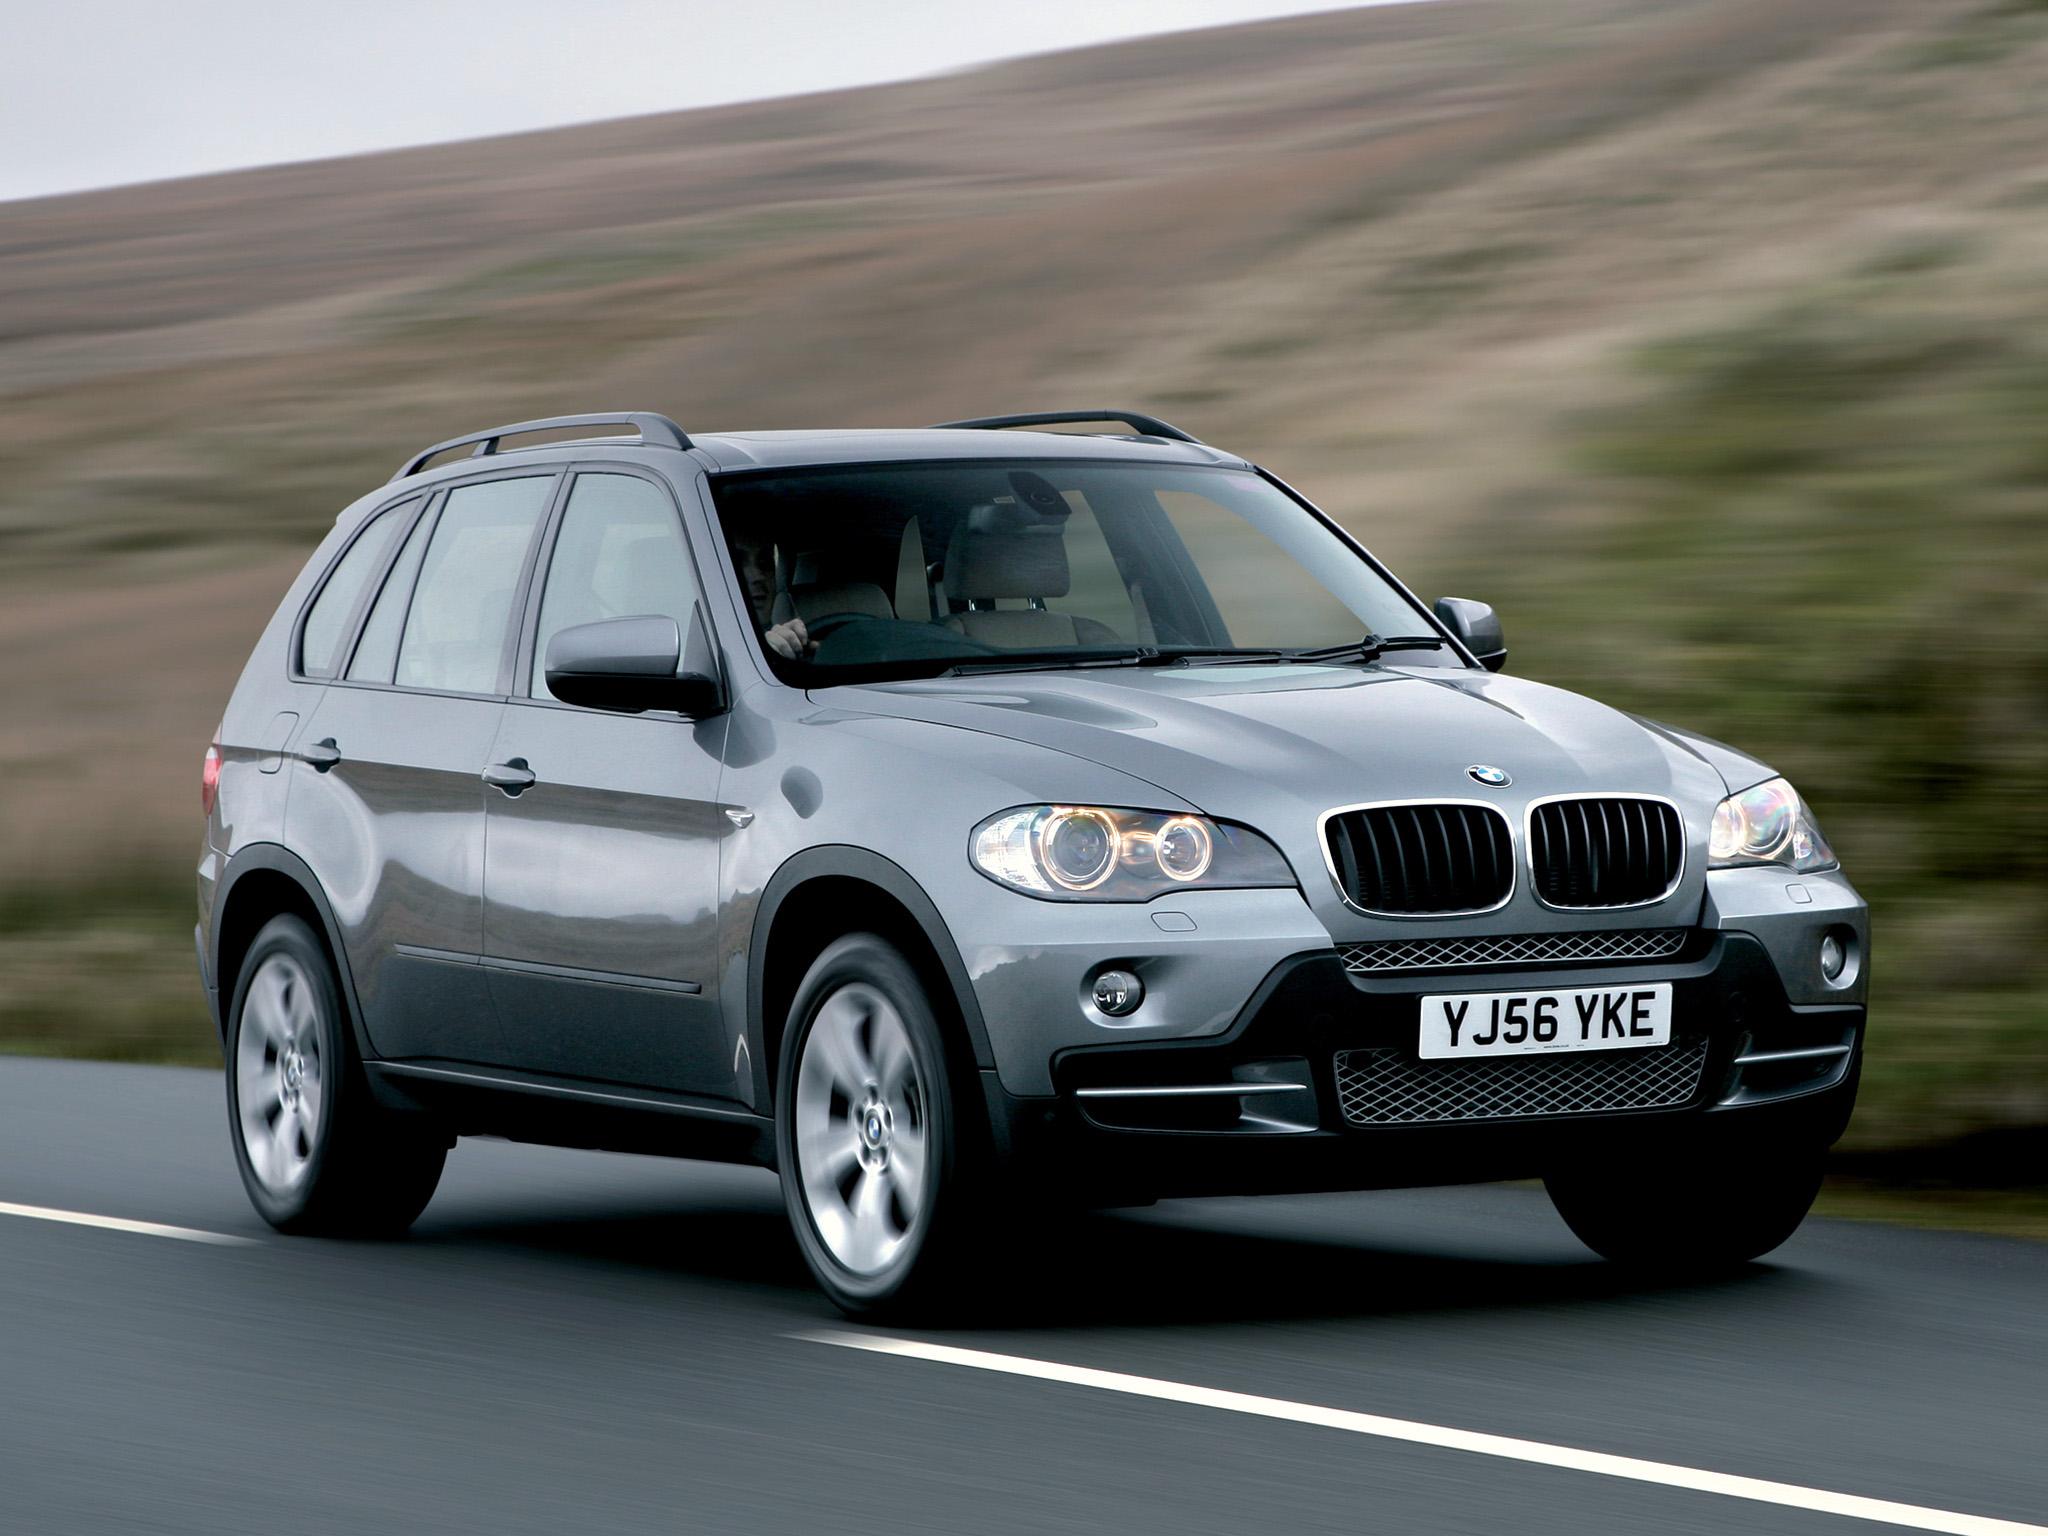 BMW X5 E70 - история, статьи, тюнинг.